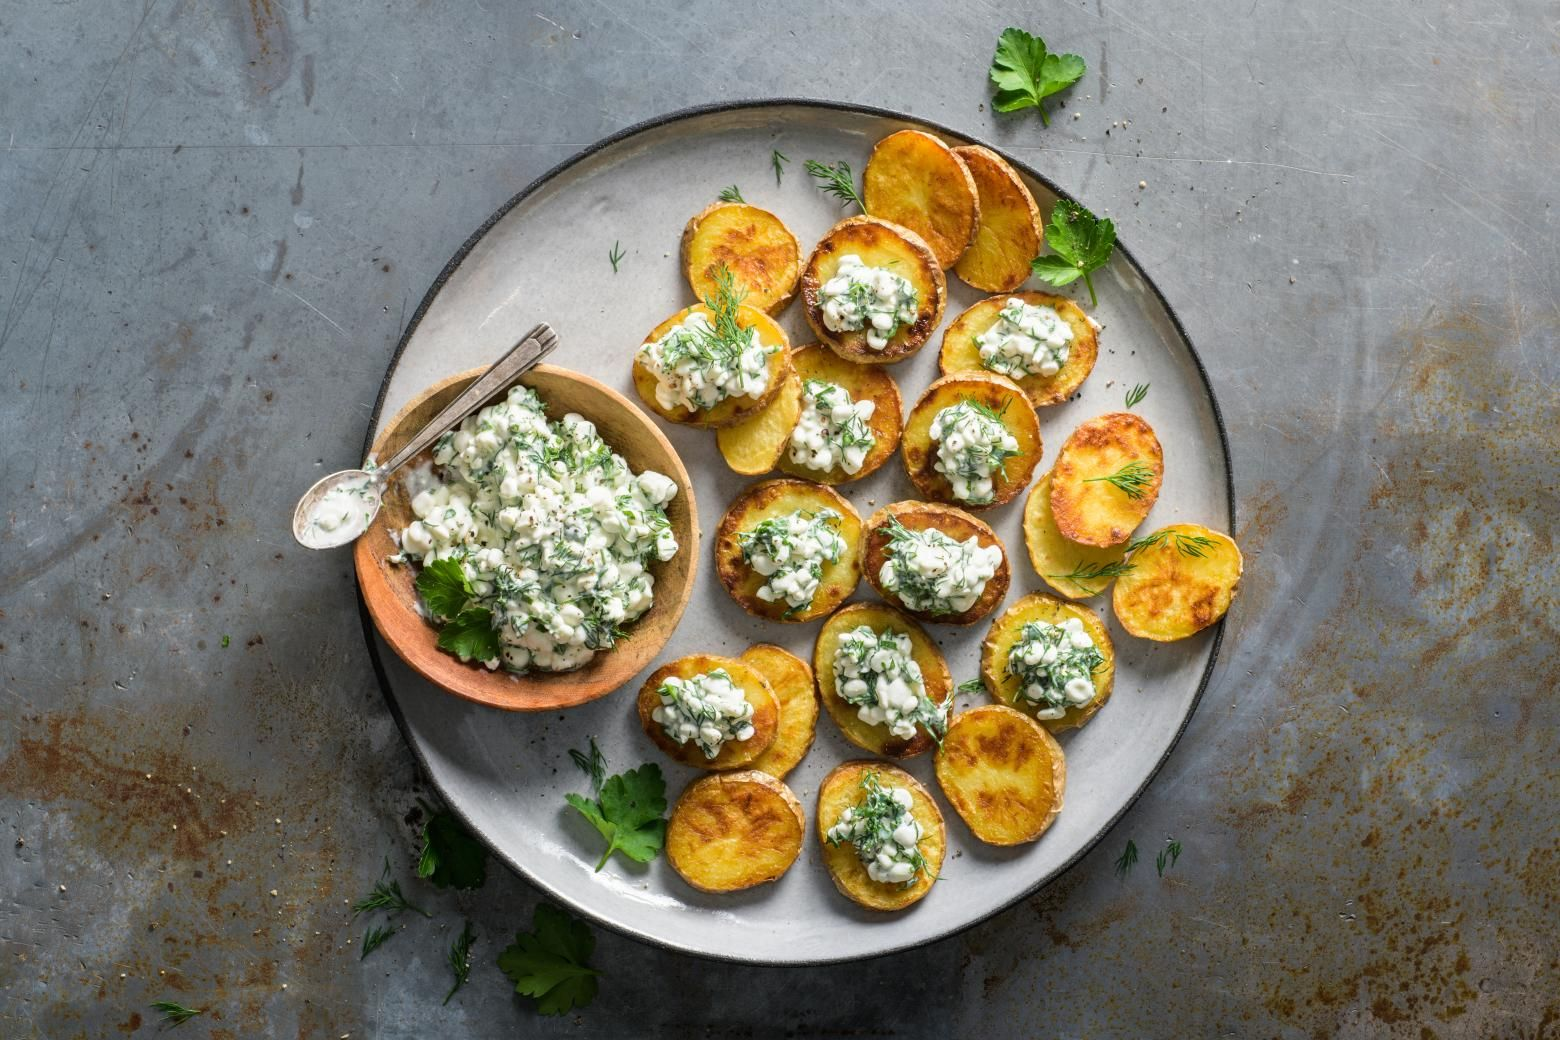 Kartoffelscheiben Mit Huttenkasesalat Recette Pomme De Terre Alimentation Recette